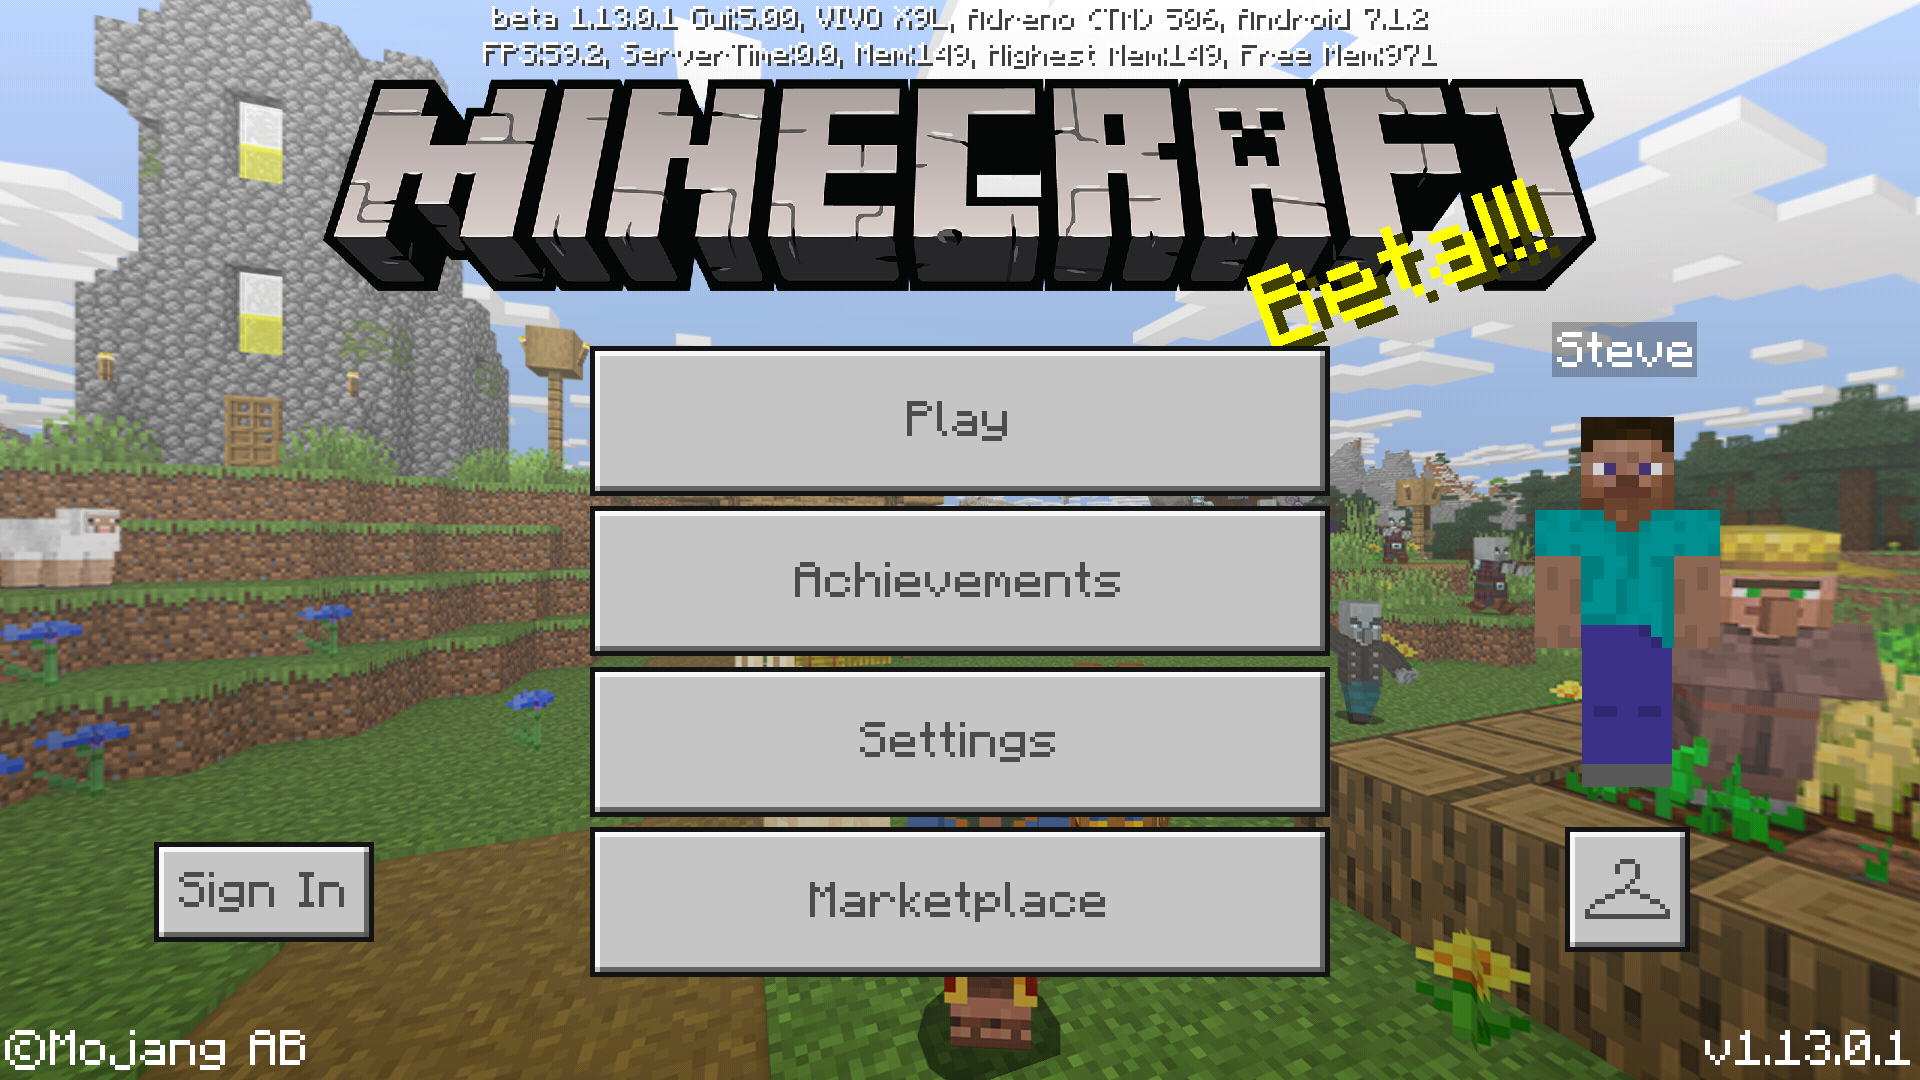 Bedrock Edition Beta 1 13 0 1 Official Minecraft Wiki